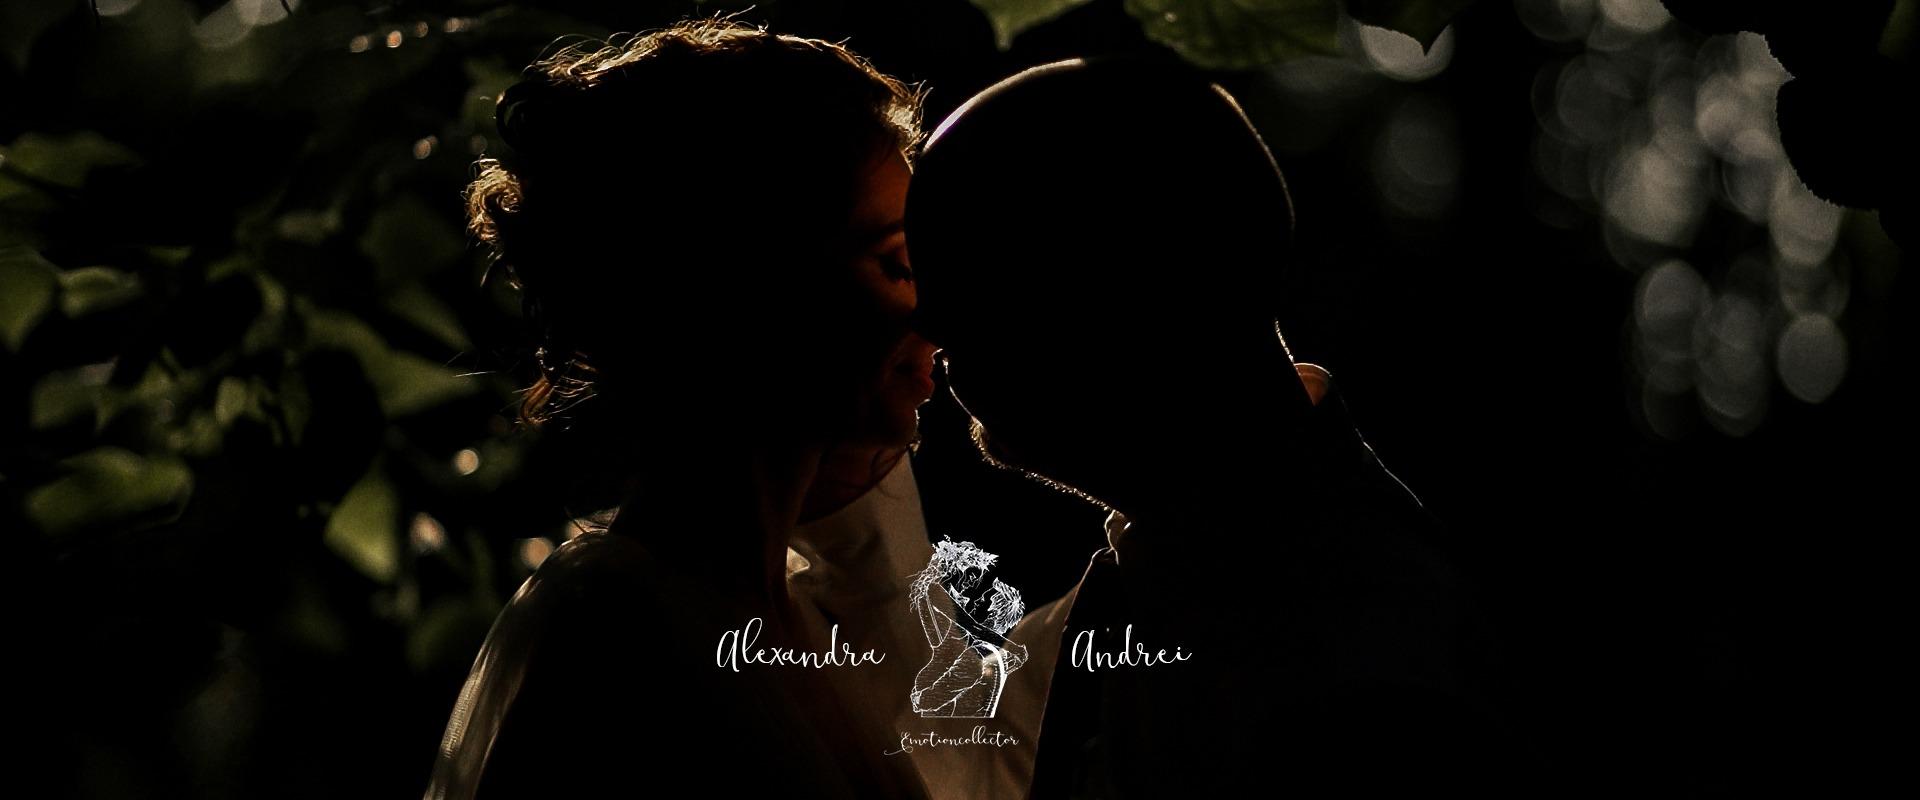 Alexandra & Andrei